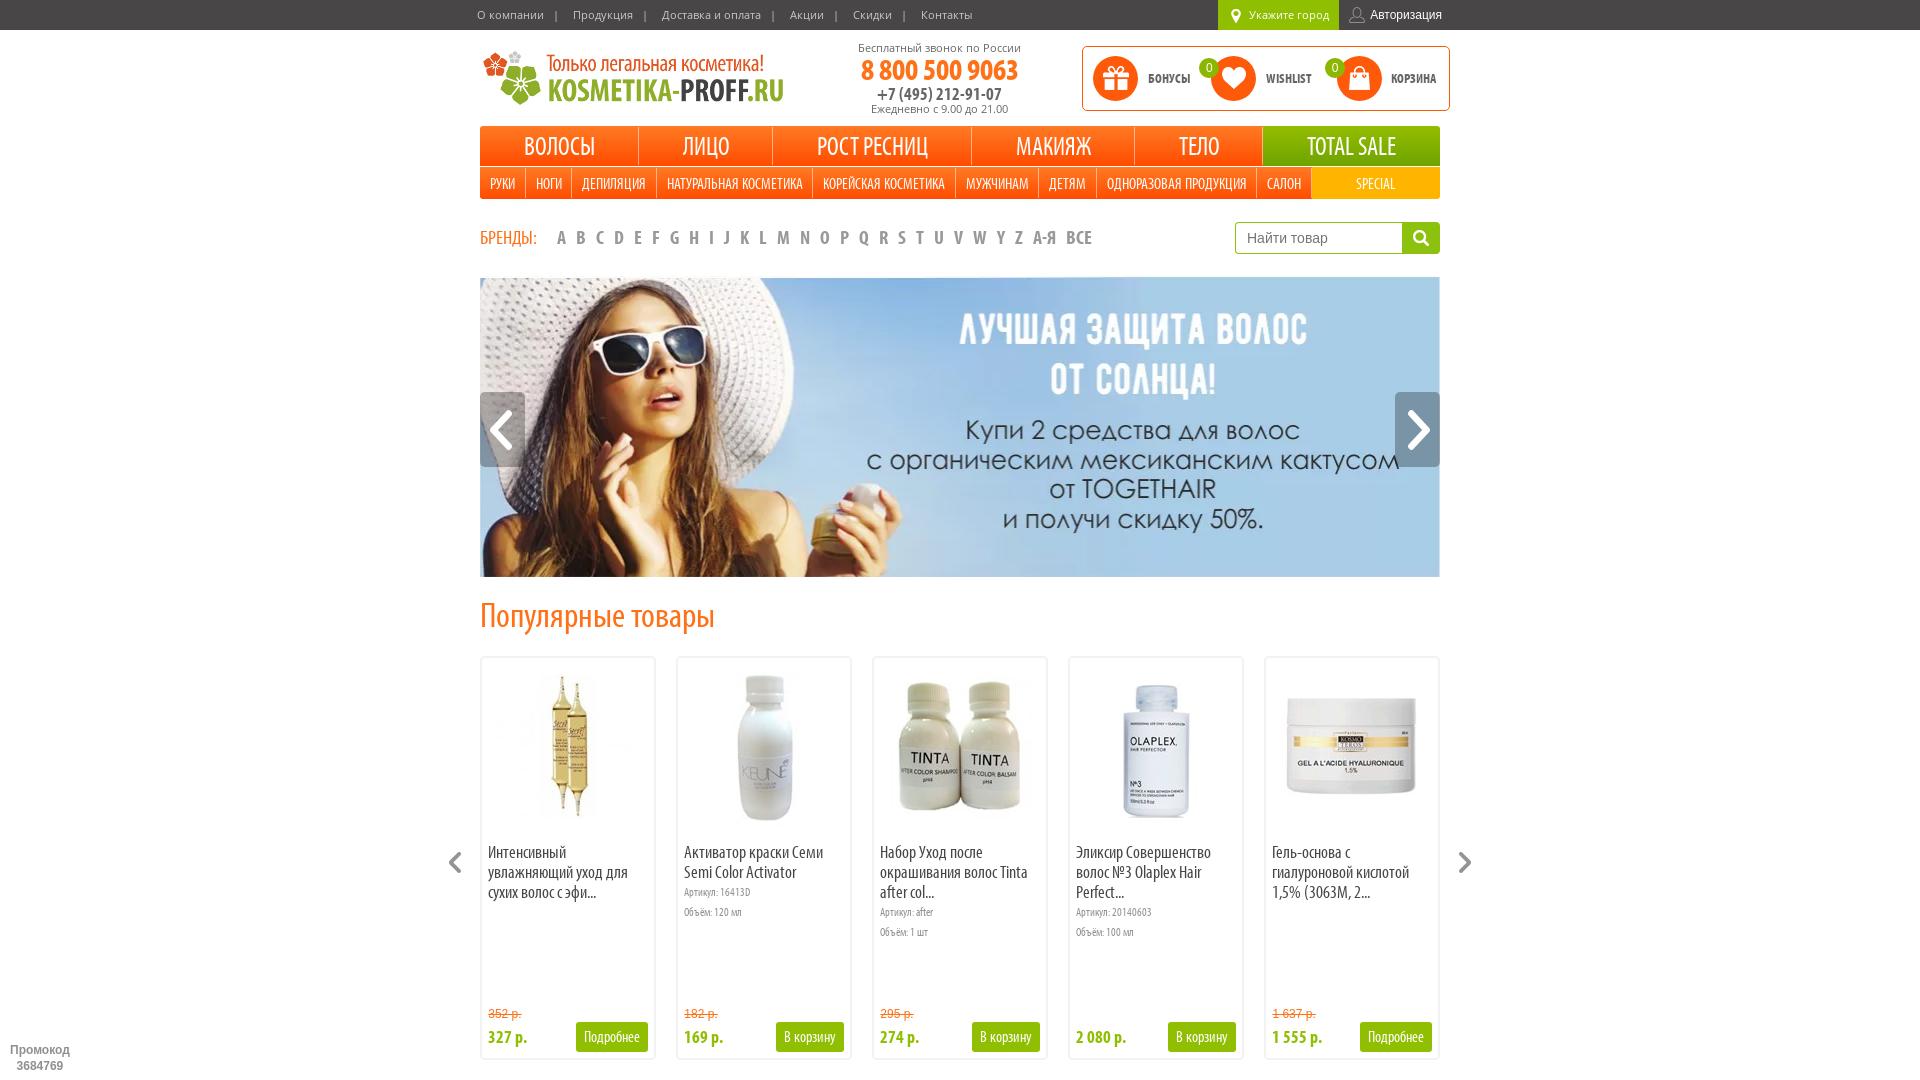 Kosmetika proff website